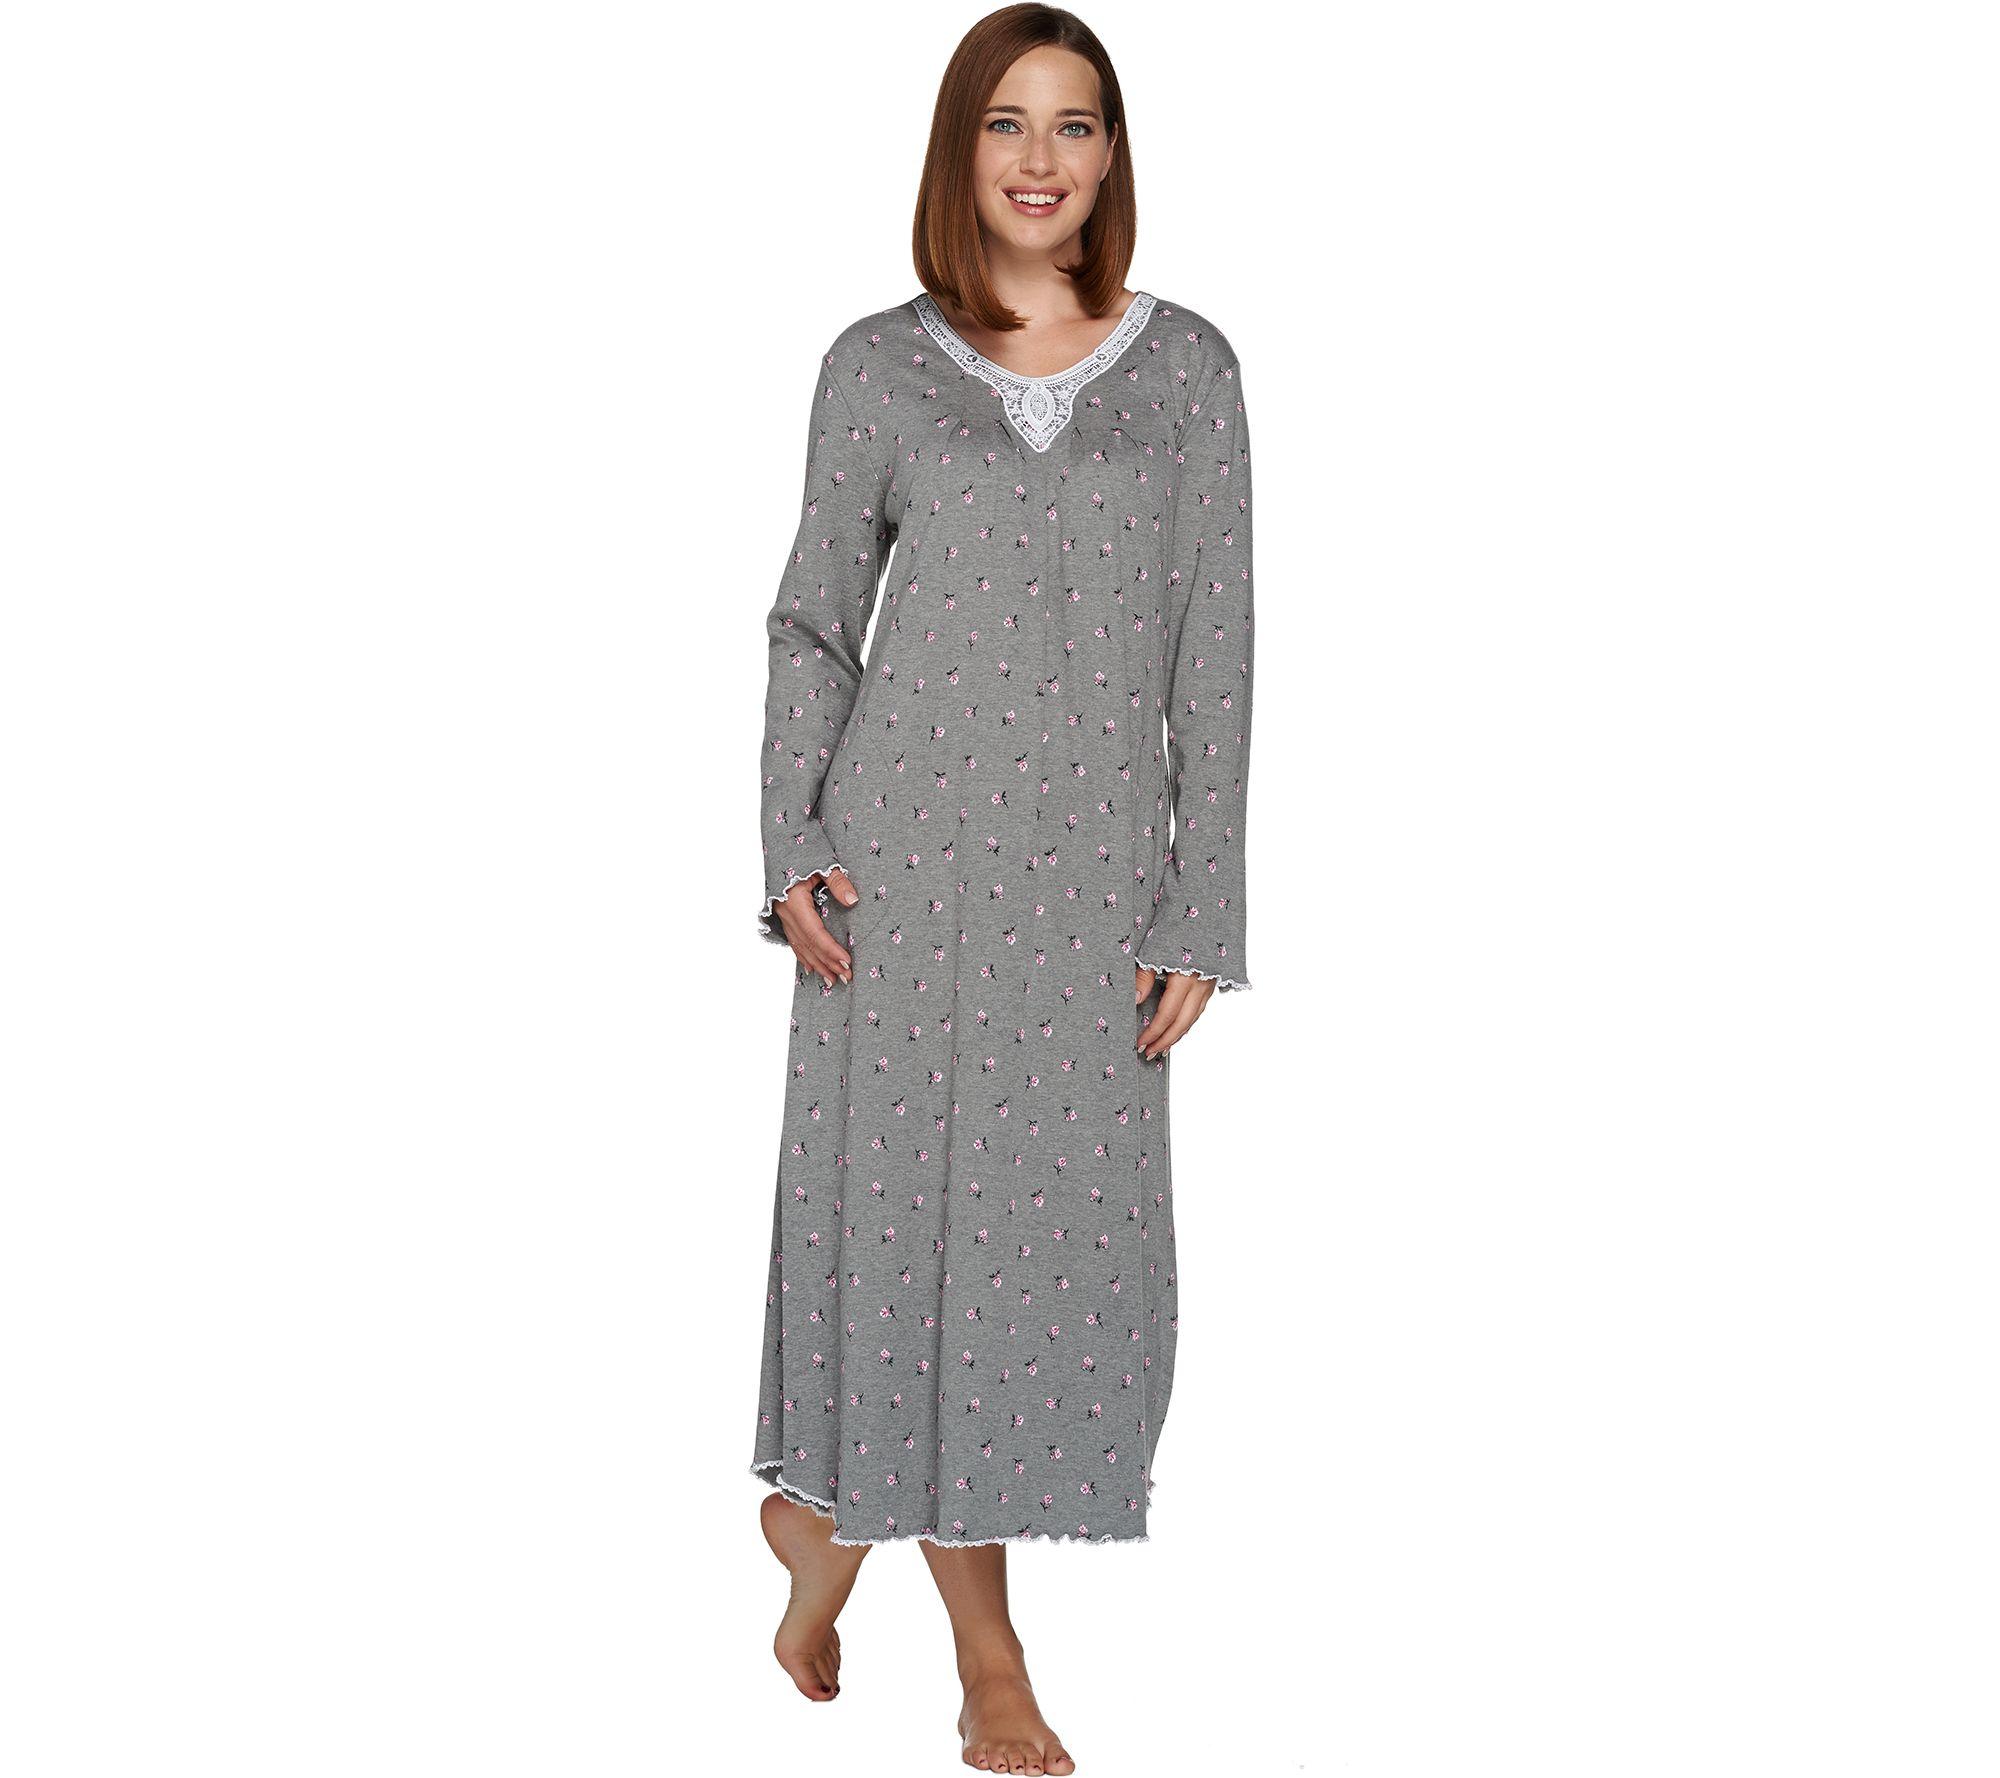 Carole Hochman Rose Bud Interlock Long Gown - Page 1 — QVC.com